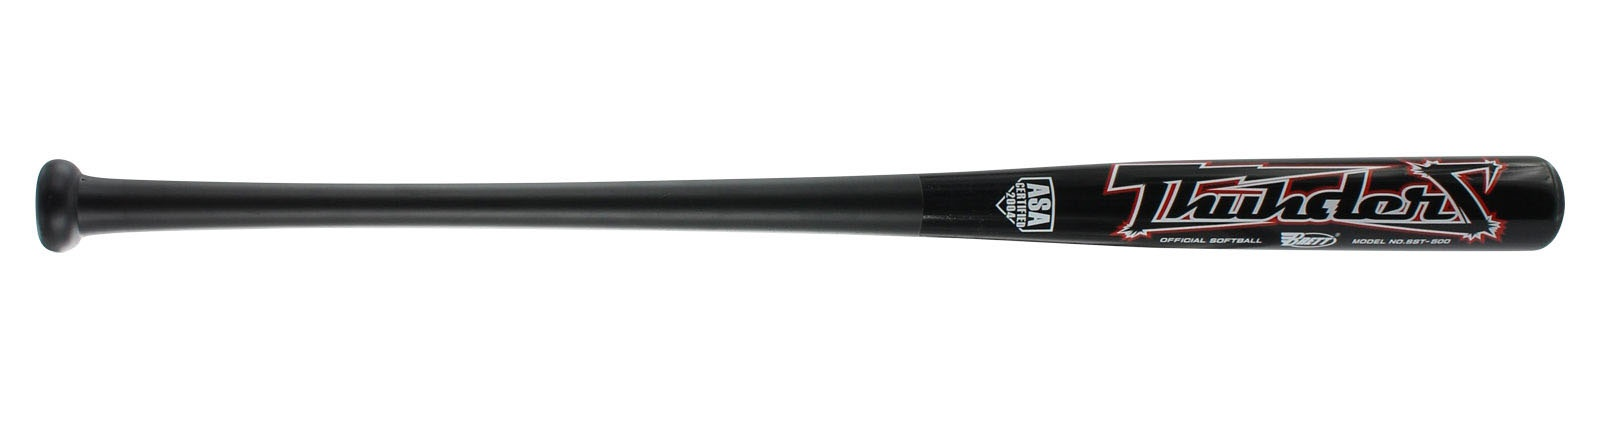 Brett Bros Thunder Slow Pitch Softball Bat.jpg